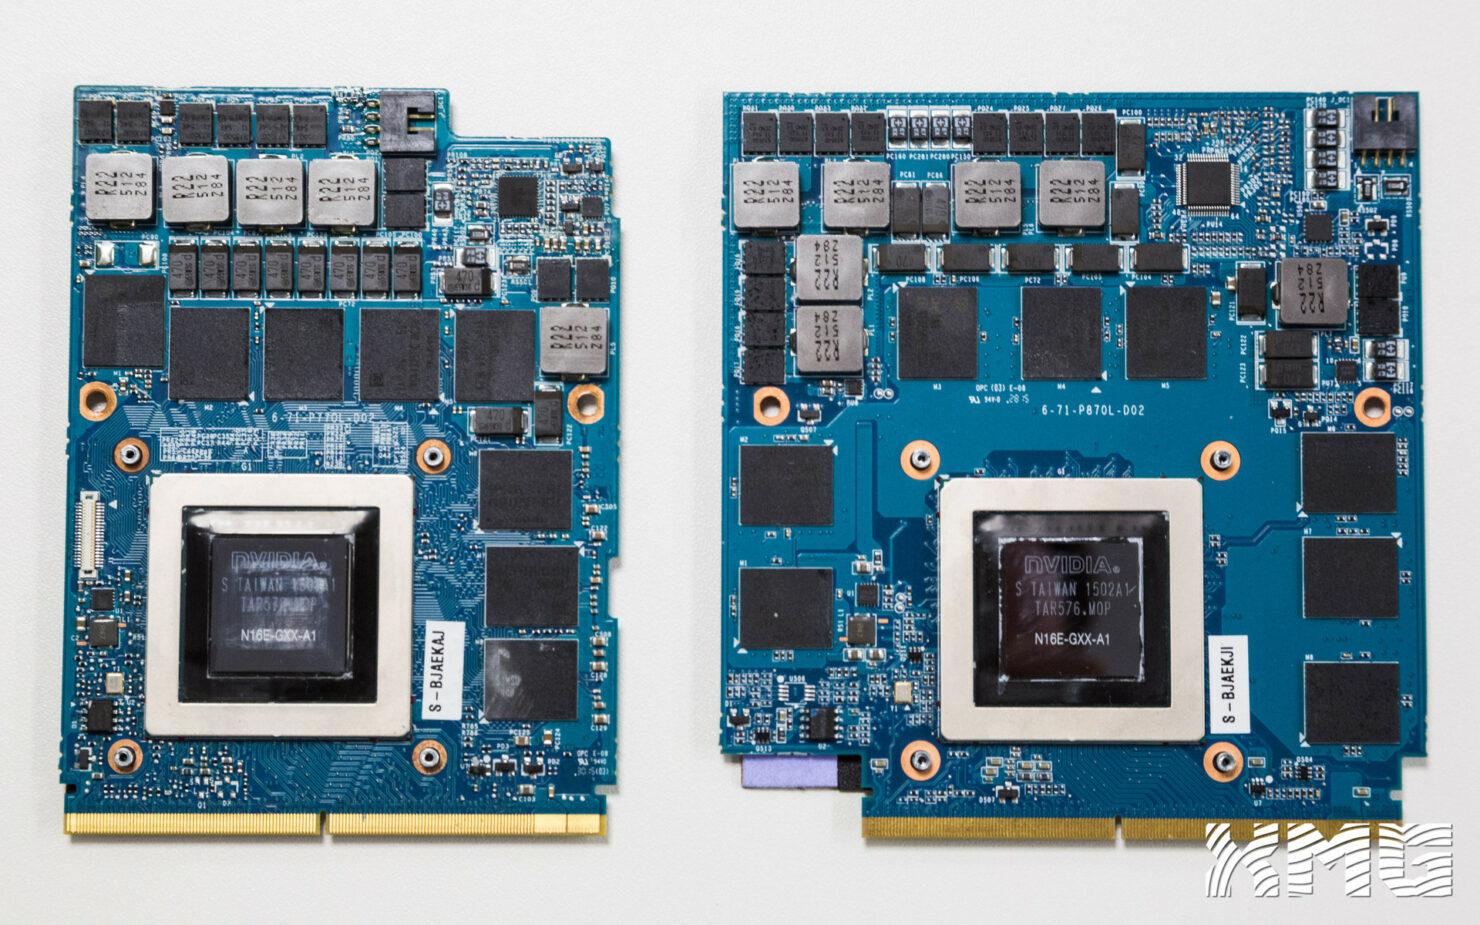 nvidia-gtx-980-and-gtx-980m